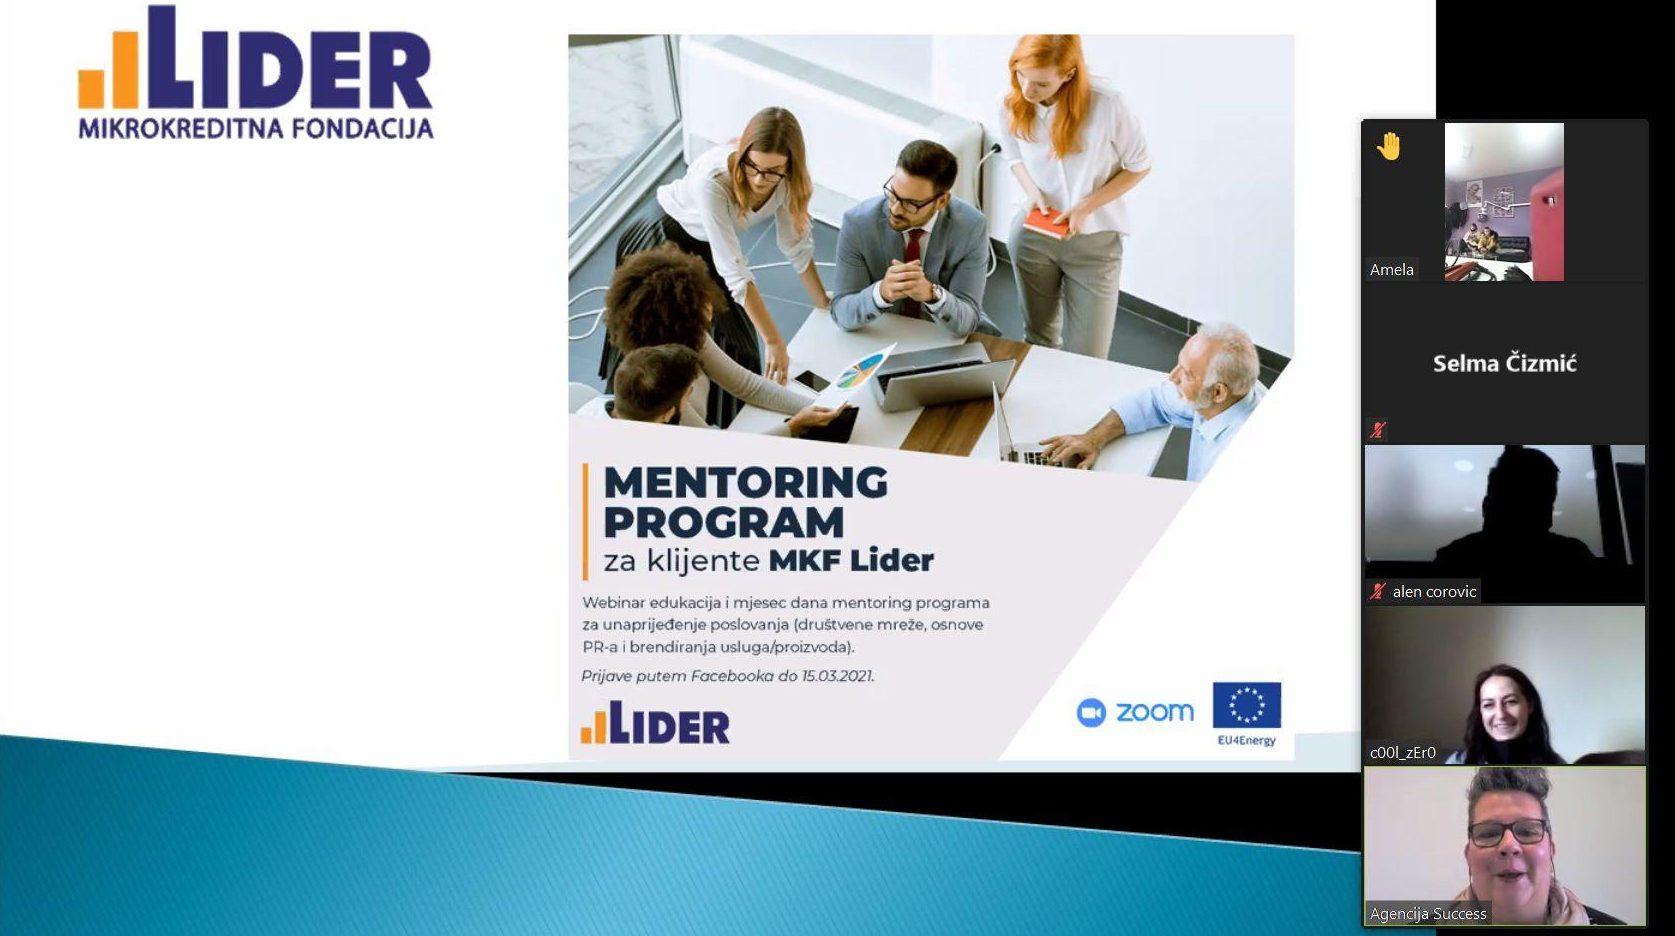 Mentoring program za LIDER klijente1.jpg